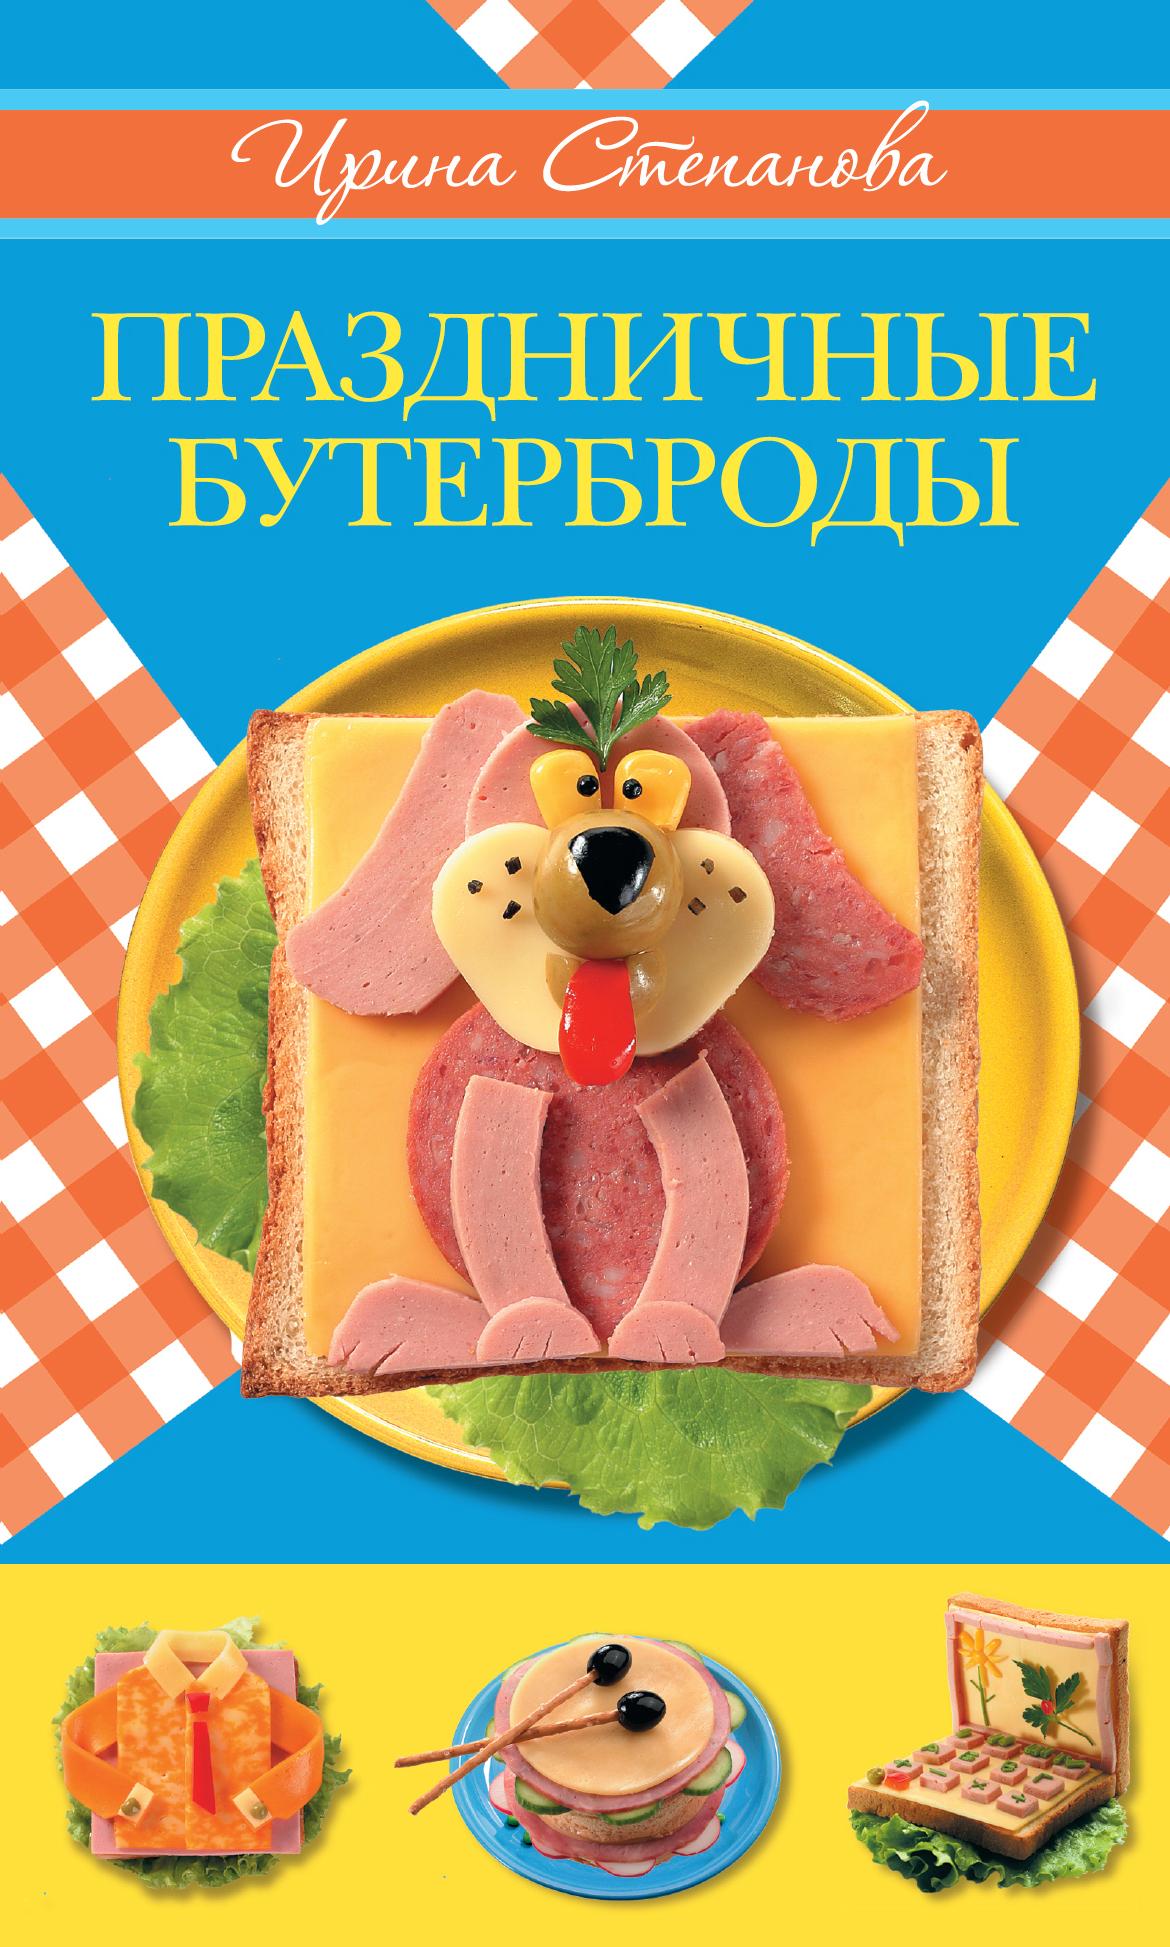 Праздничные бутерброды